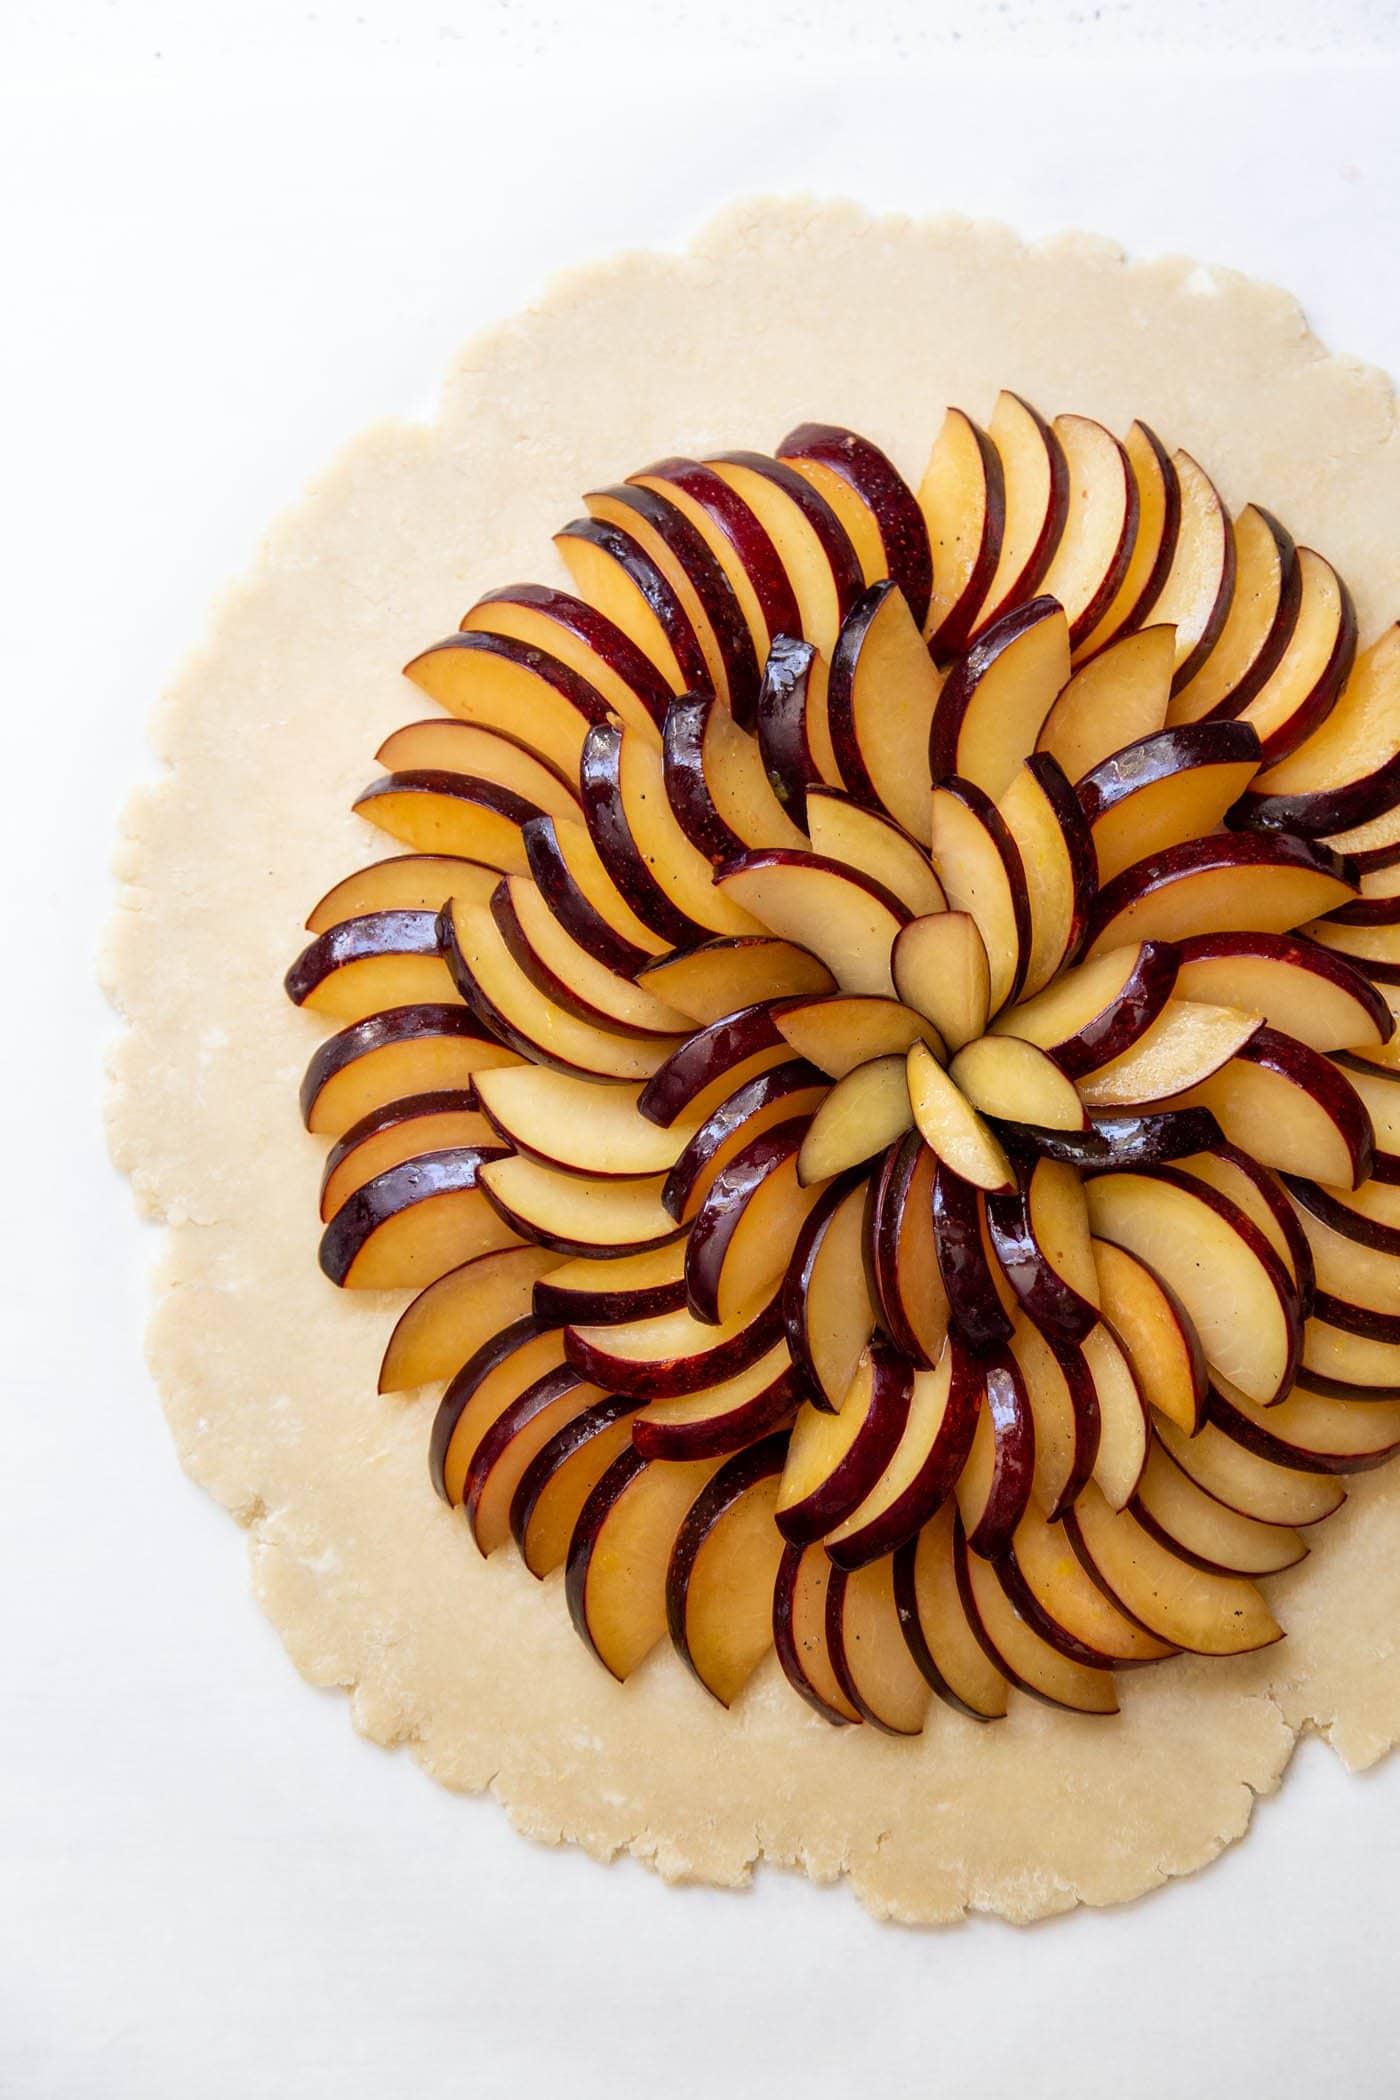 Assembling plum slices on pie crust